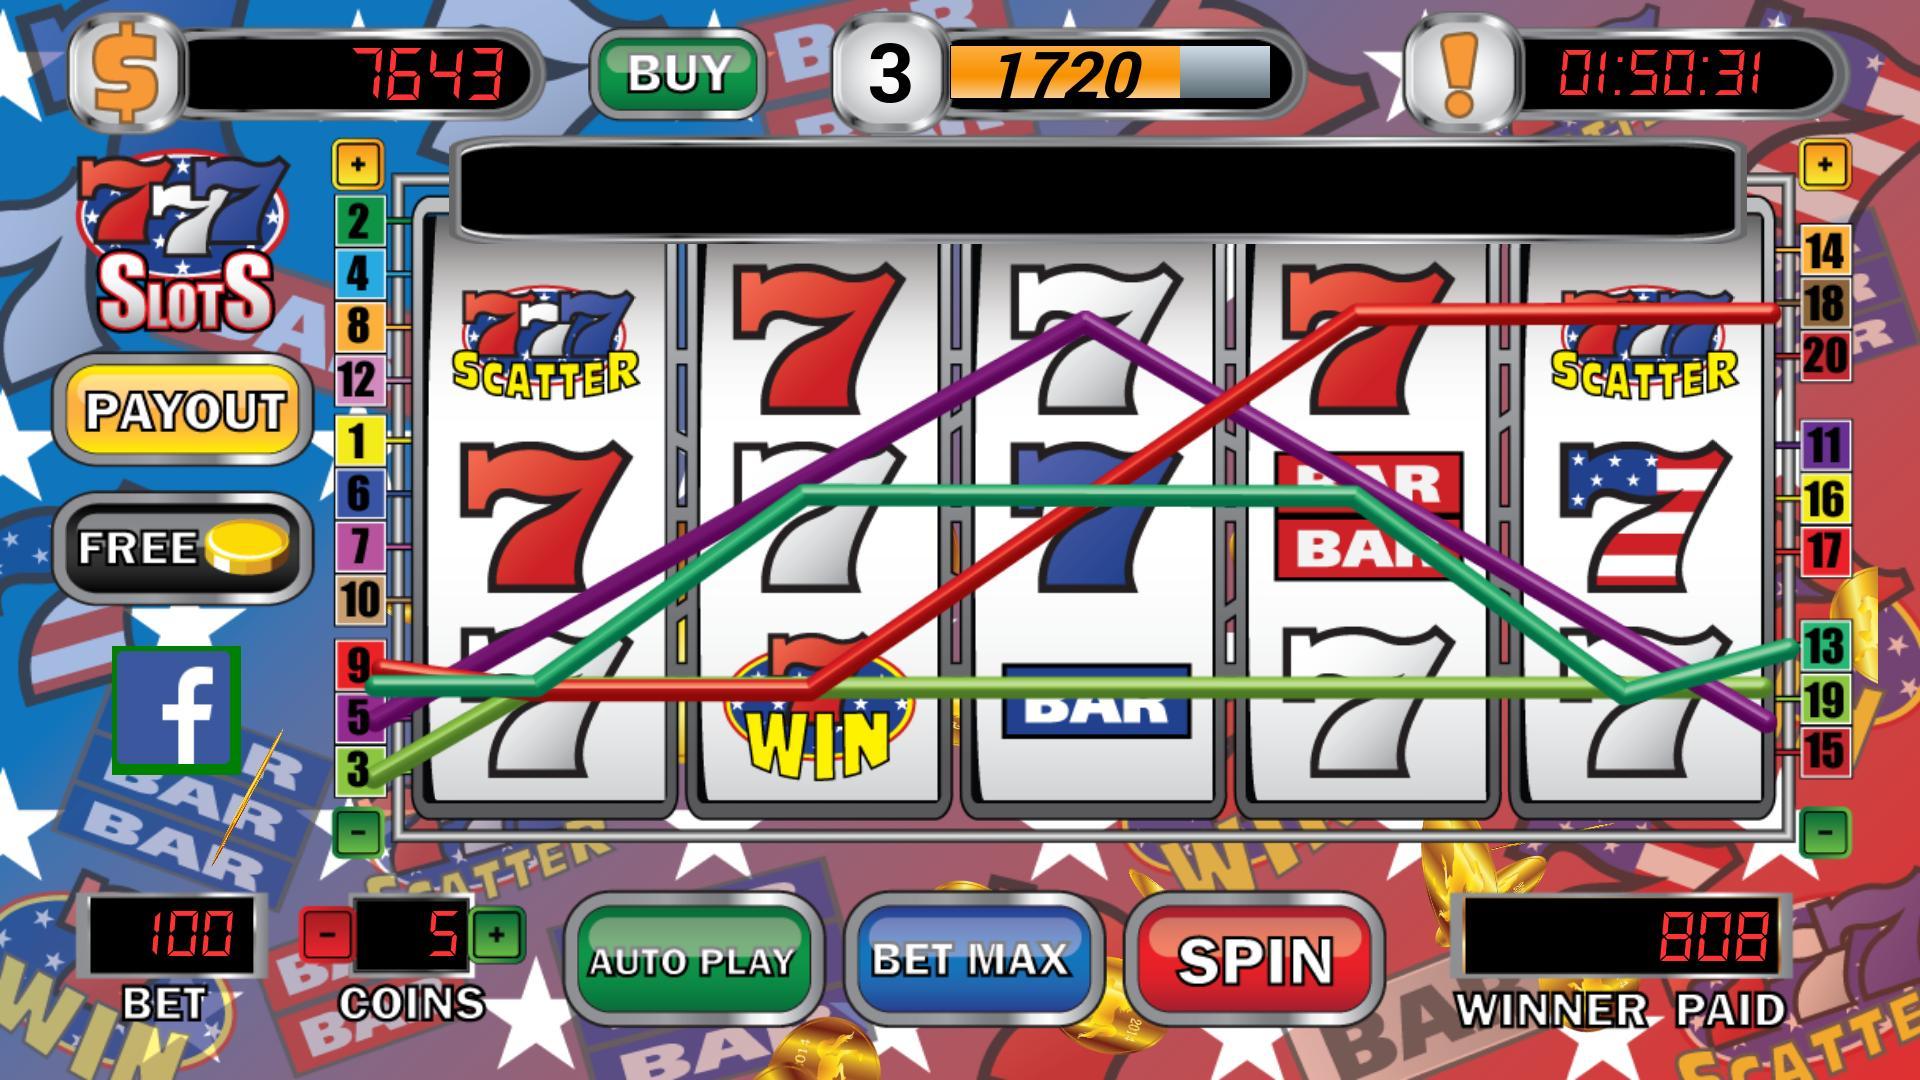 Triple 7 Cash Slot Machine For Android Apk Download